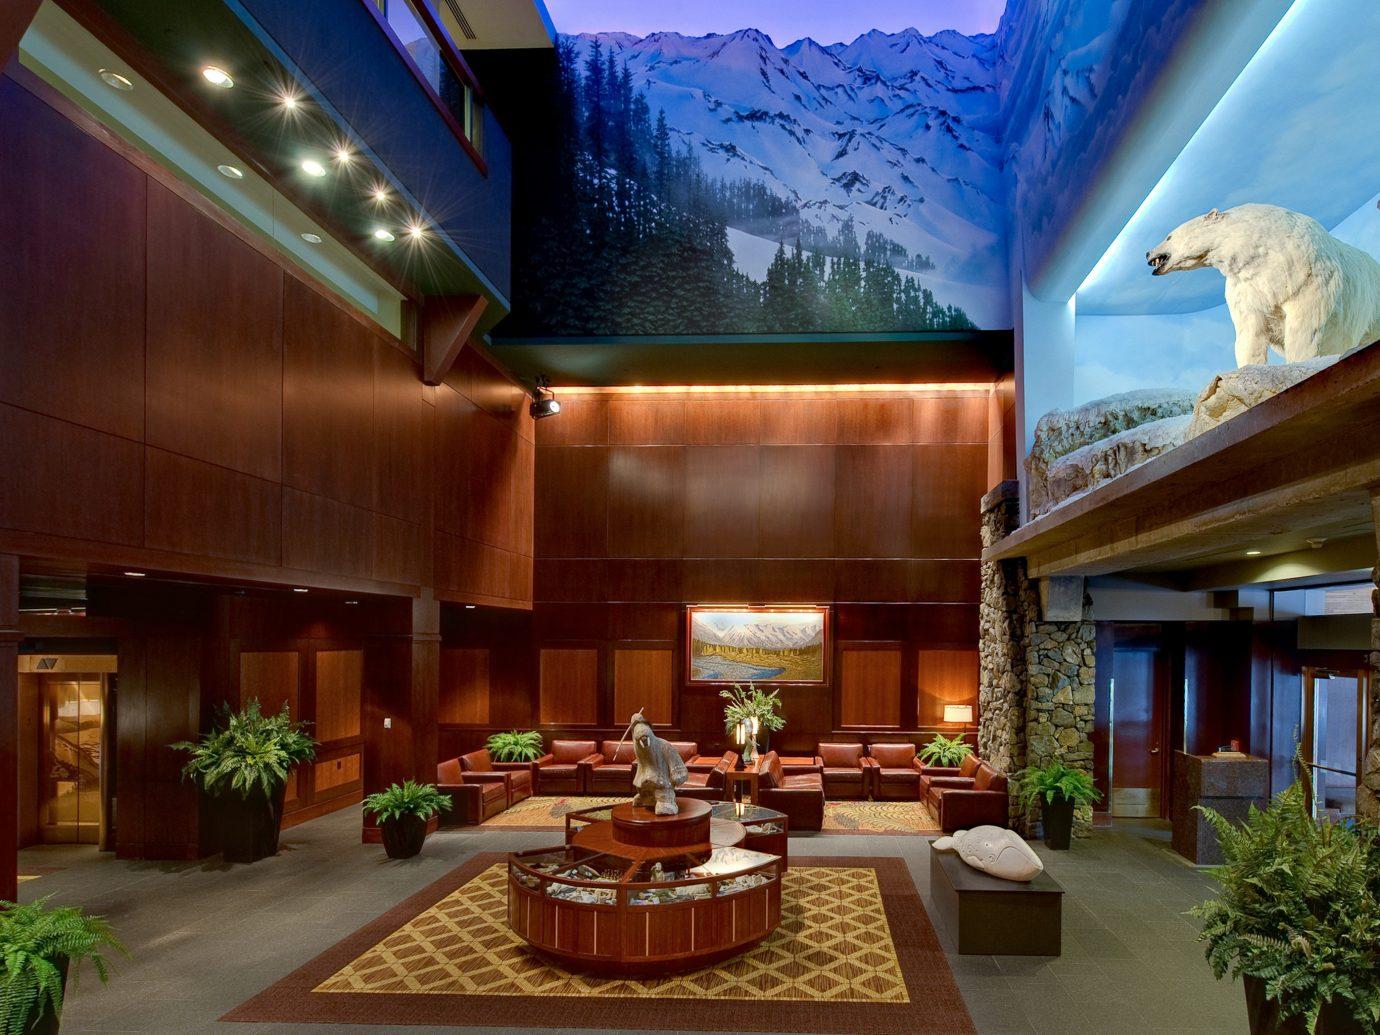 Business Living Lobby Lounge Trip Ideas room estate interior design home screenshot mansion real estate Resort living room furniture